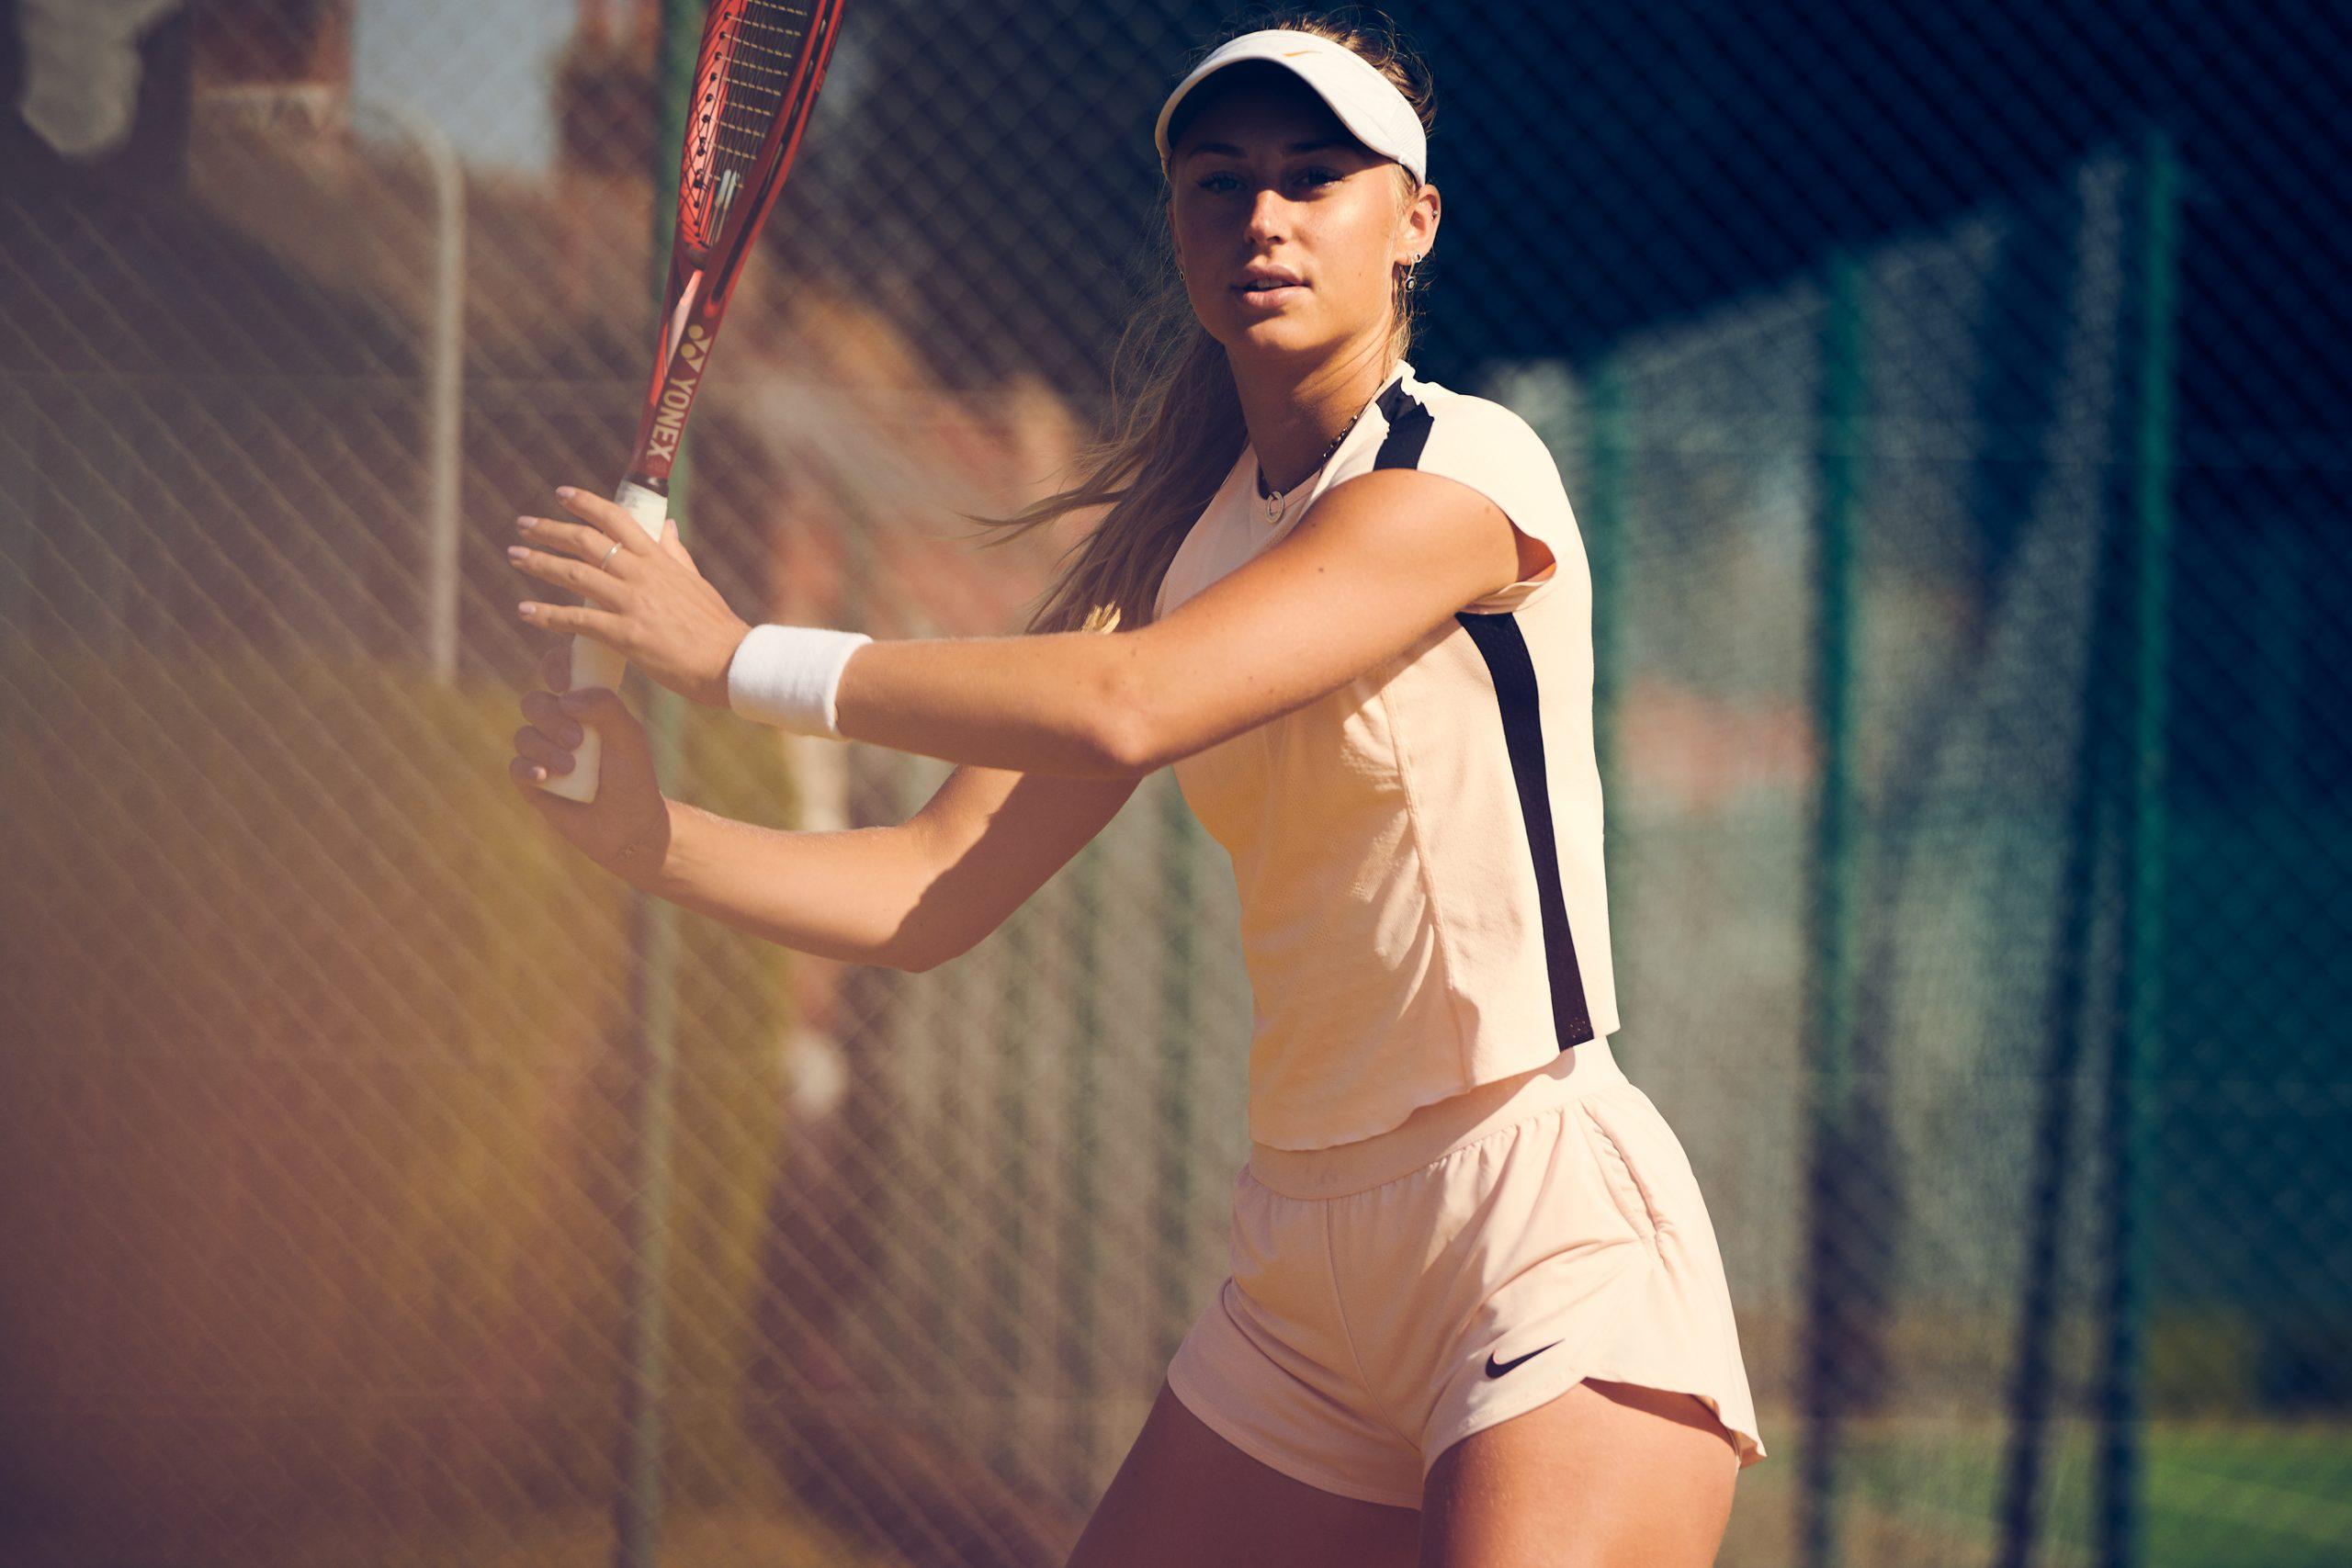 Forte_Olivia_Tennis_0087